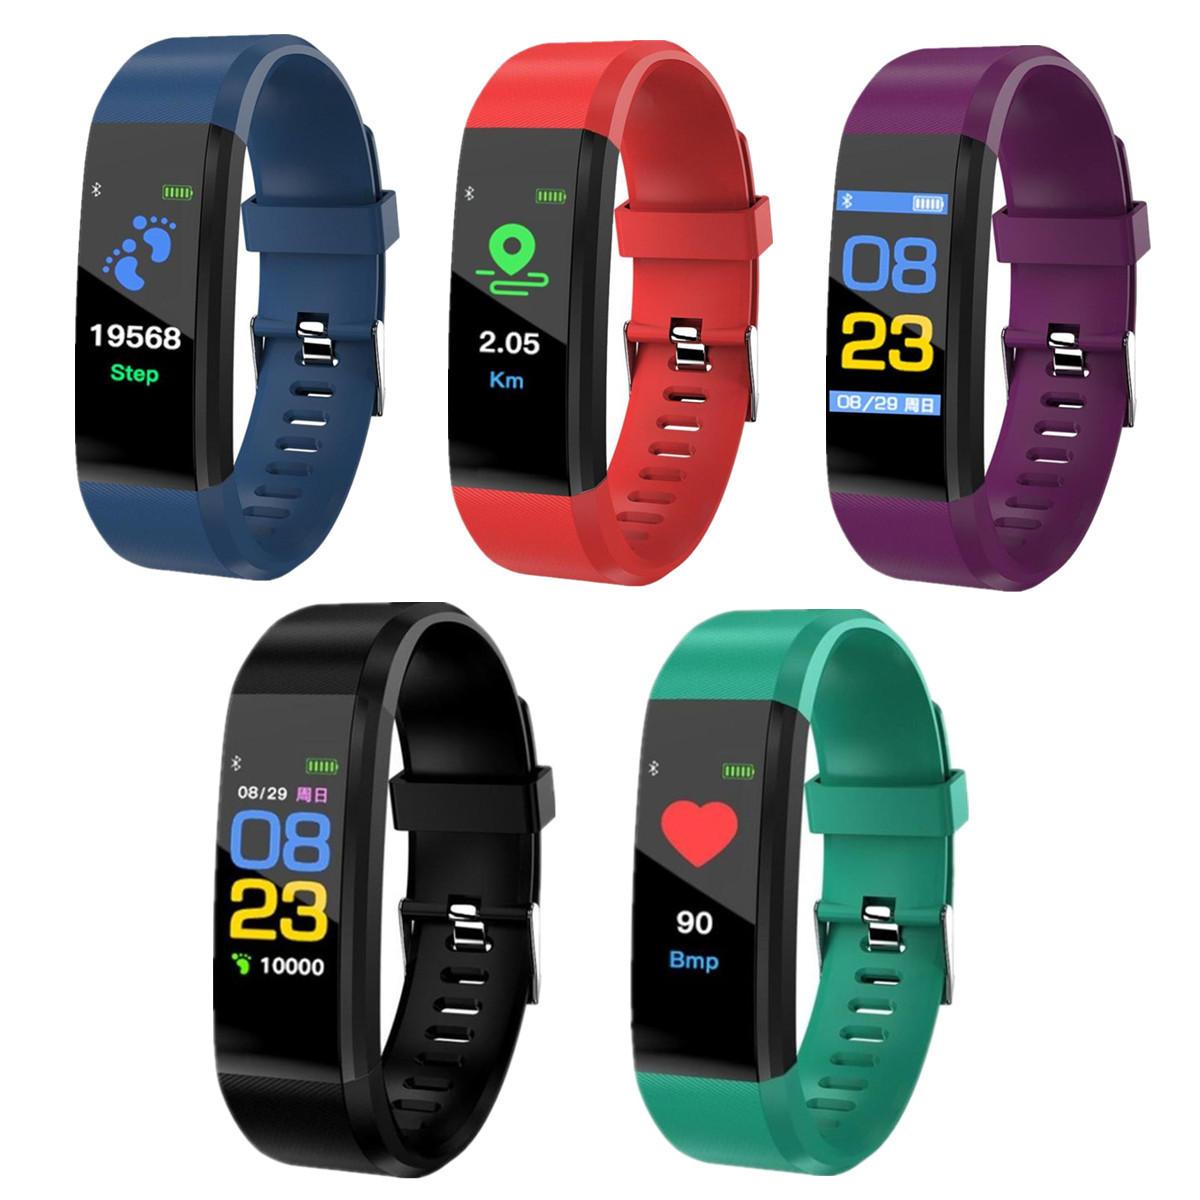 Xanes B05 Smartwatch - Blutdruck, Herzfrequenz + Standards